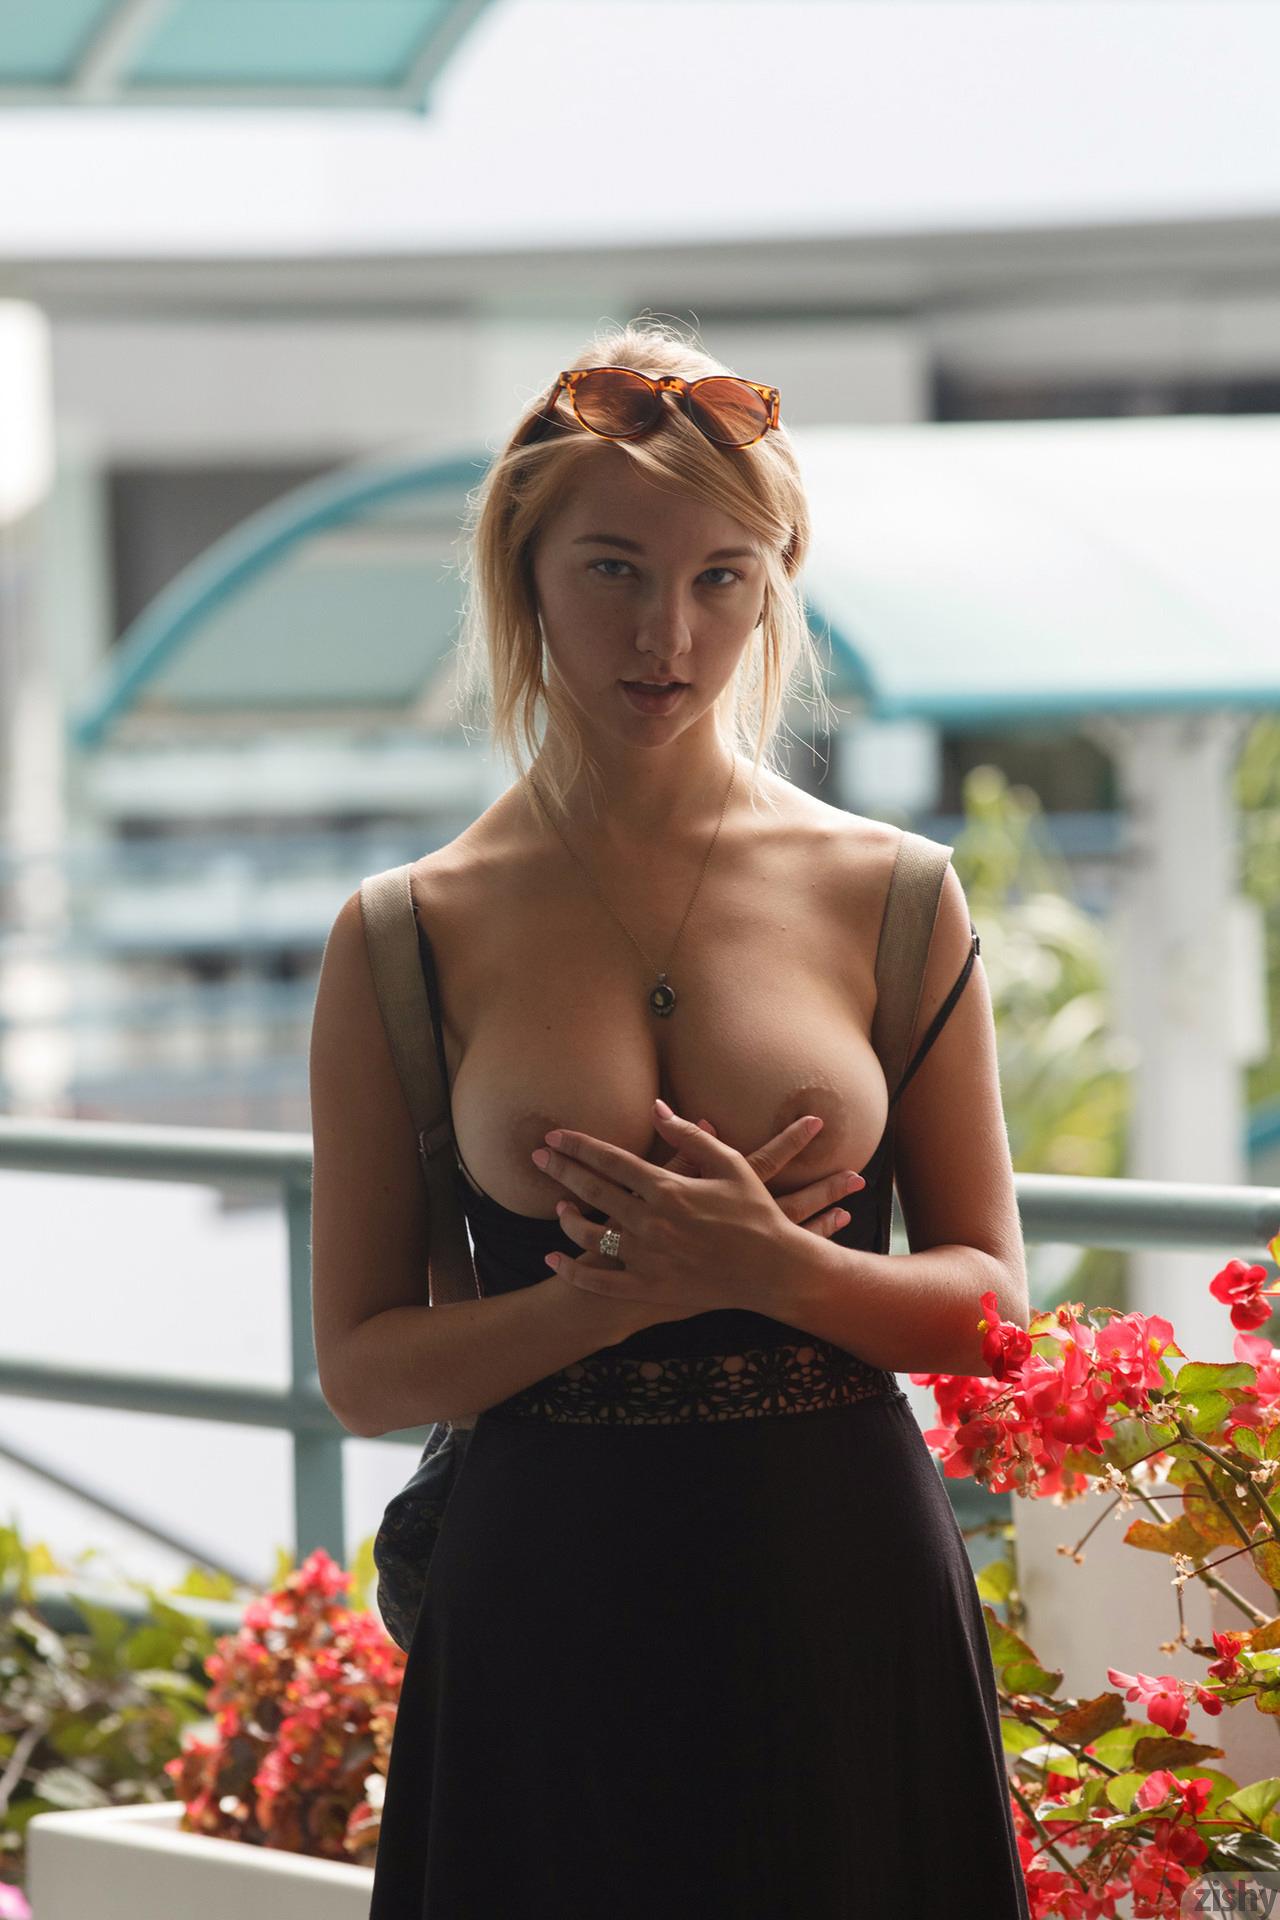 Zishy Lily Ivy Bike Seat Blues - Sexy Now Nude Teens-8812